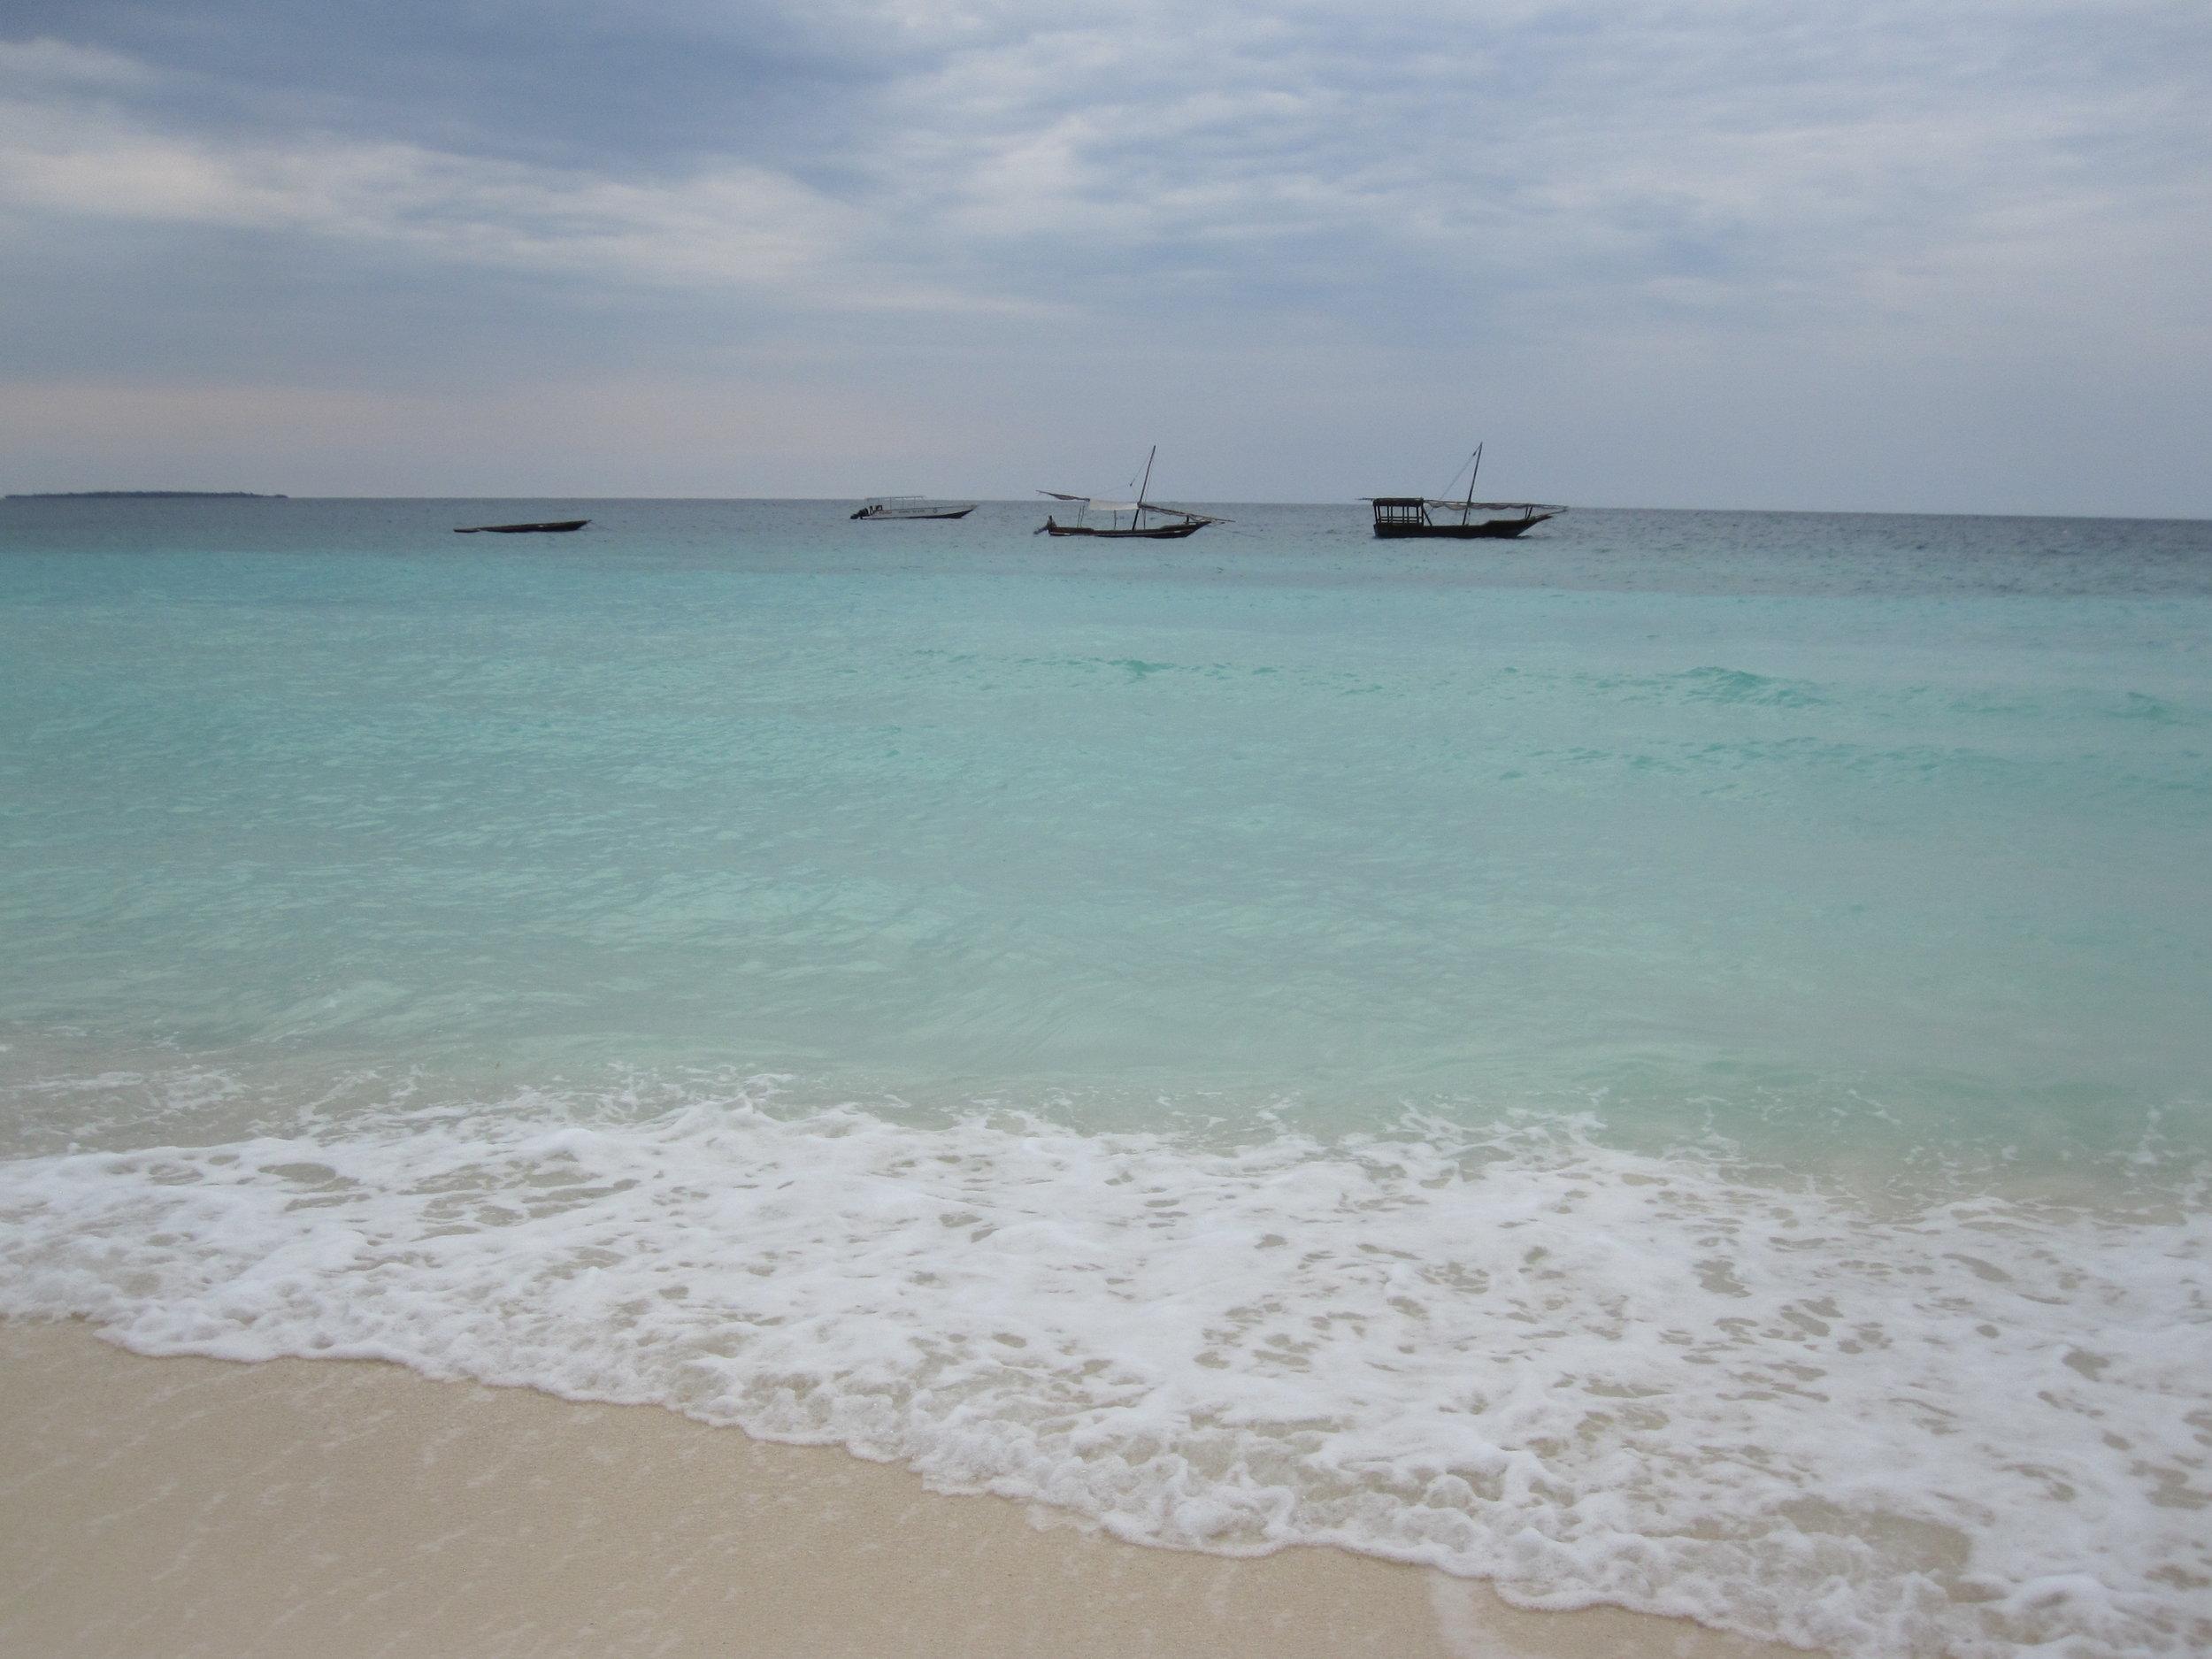 Dhows in the water in Zanzibar